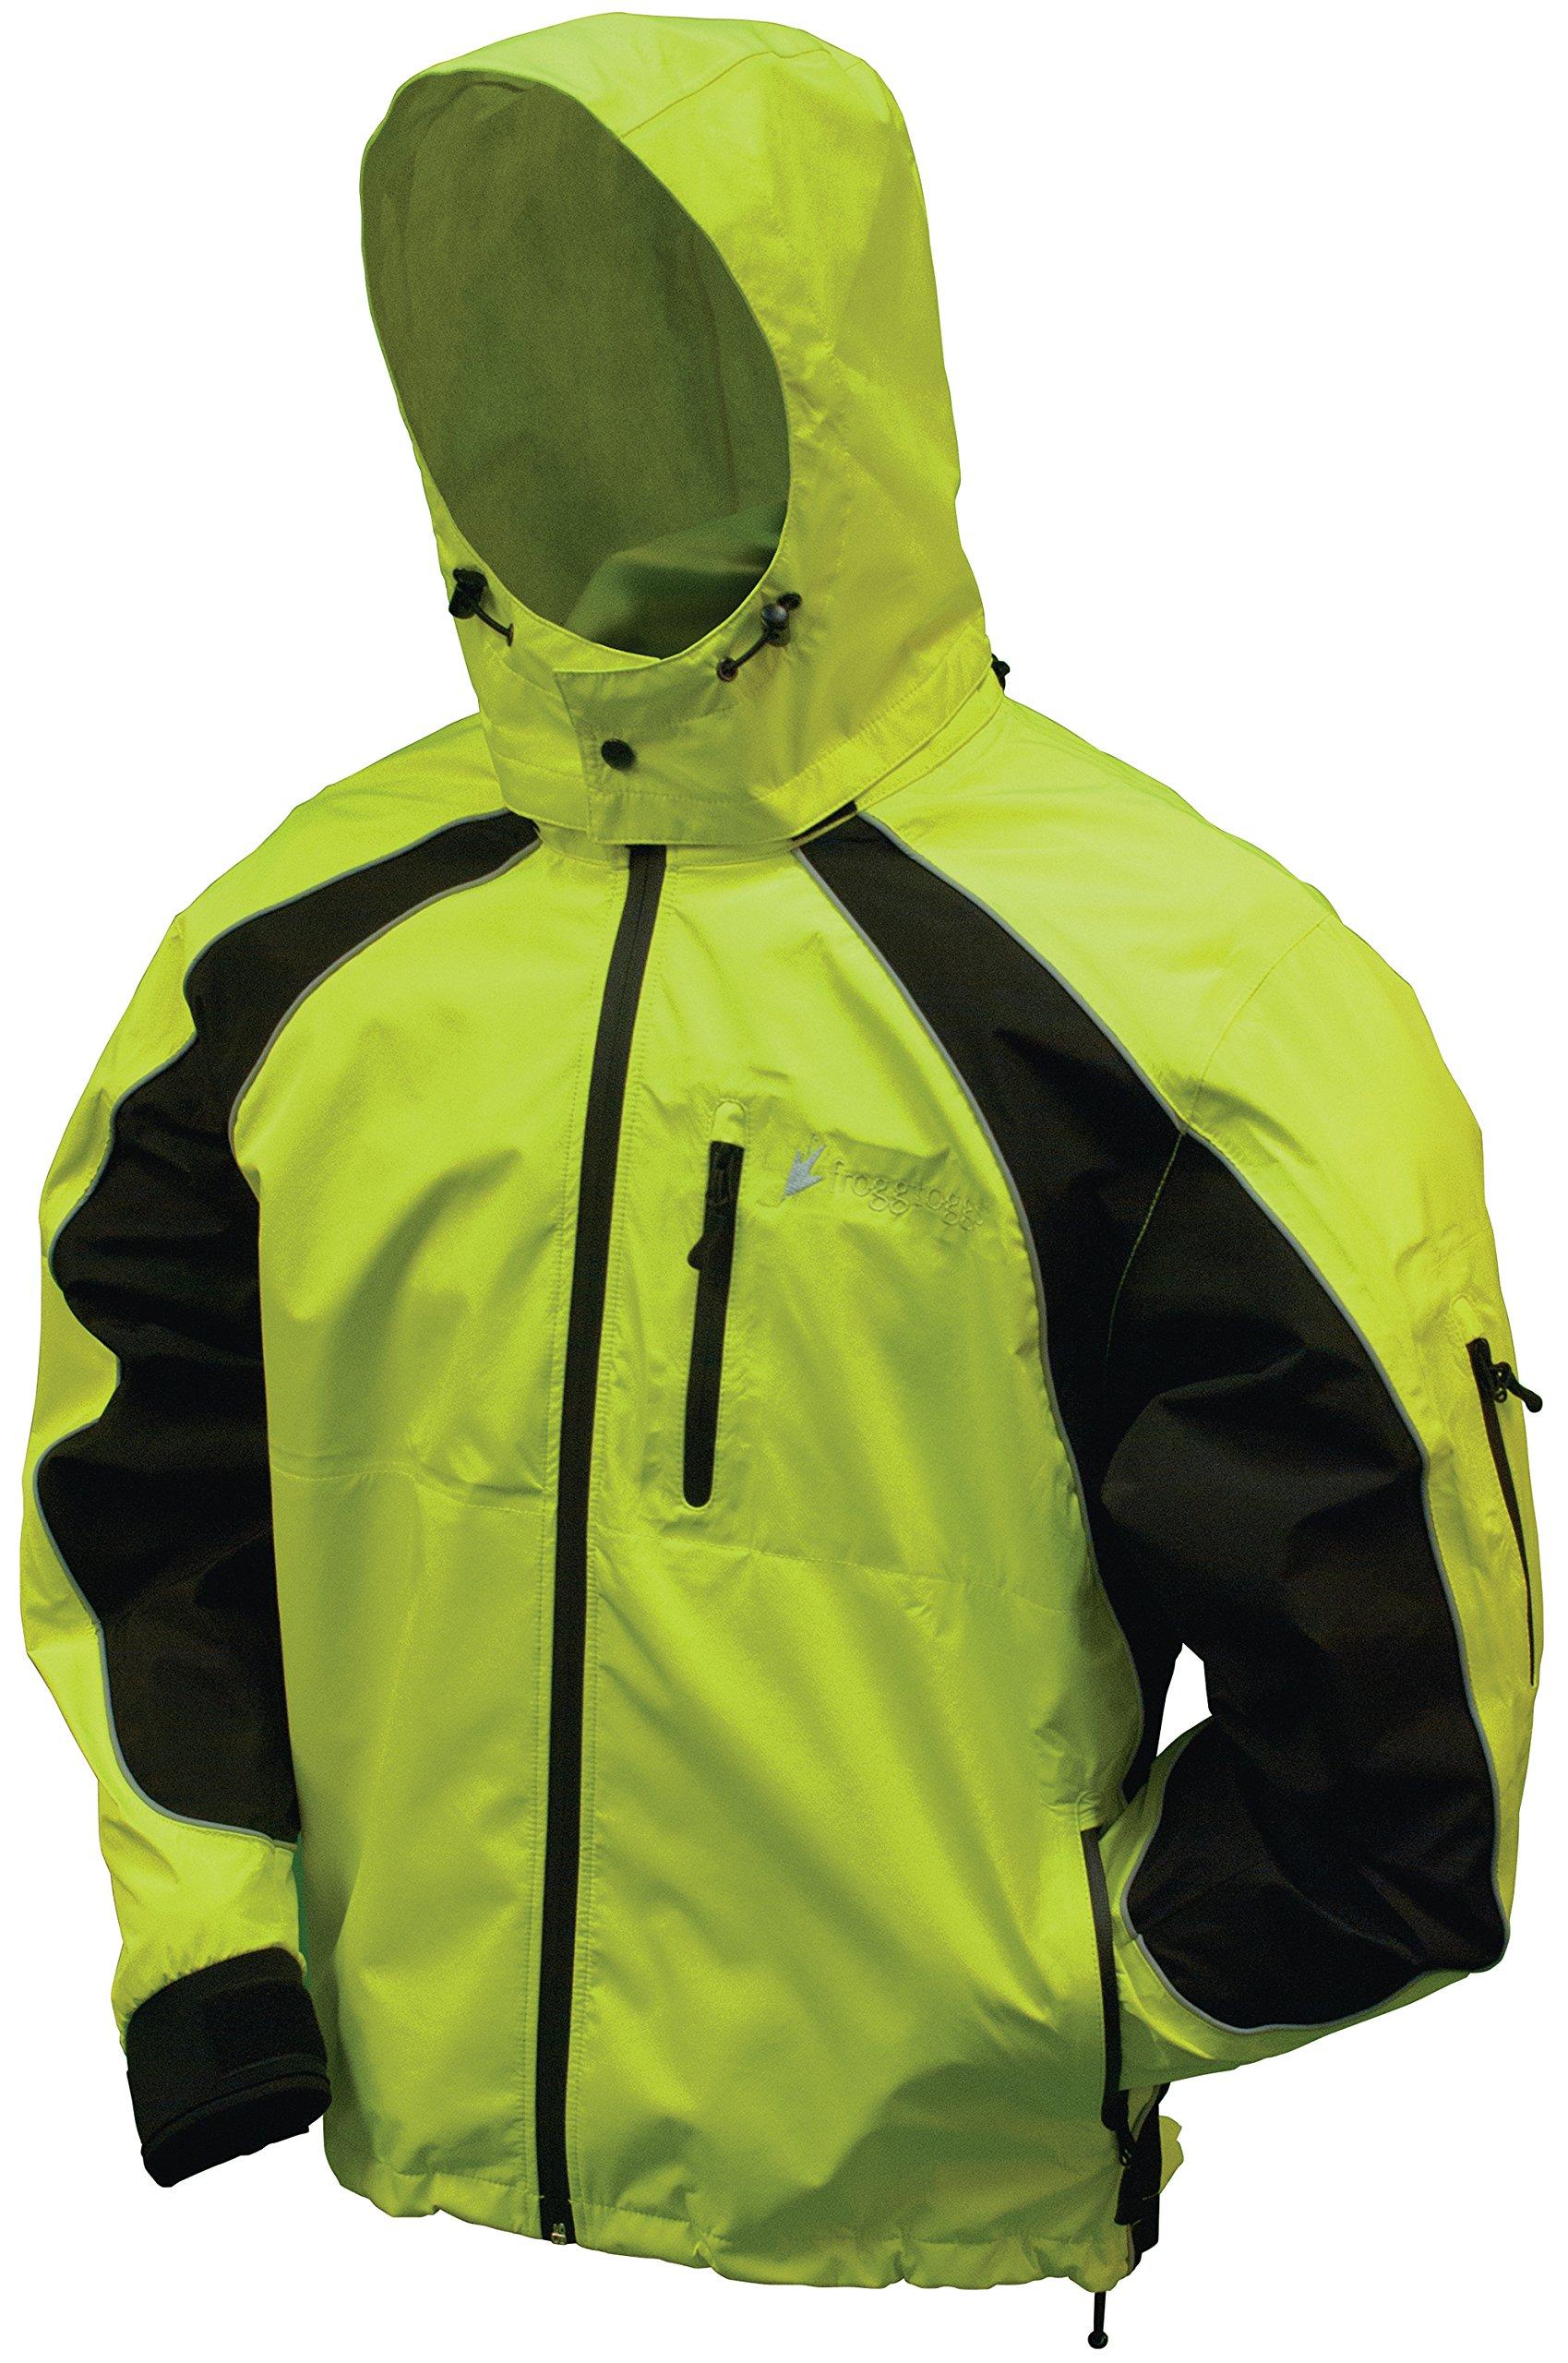 Frogg Toggs Toadz Kikker II Reflective Jacket, Hivis Green, Size XX-Large